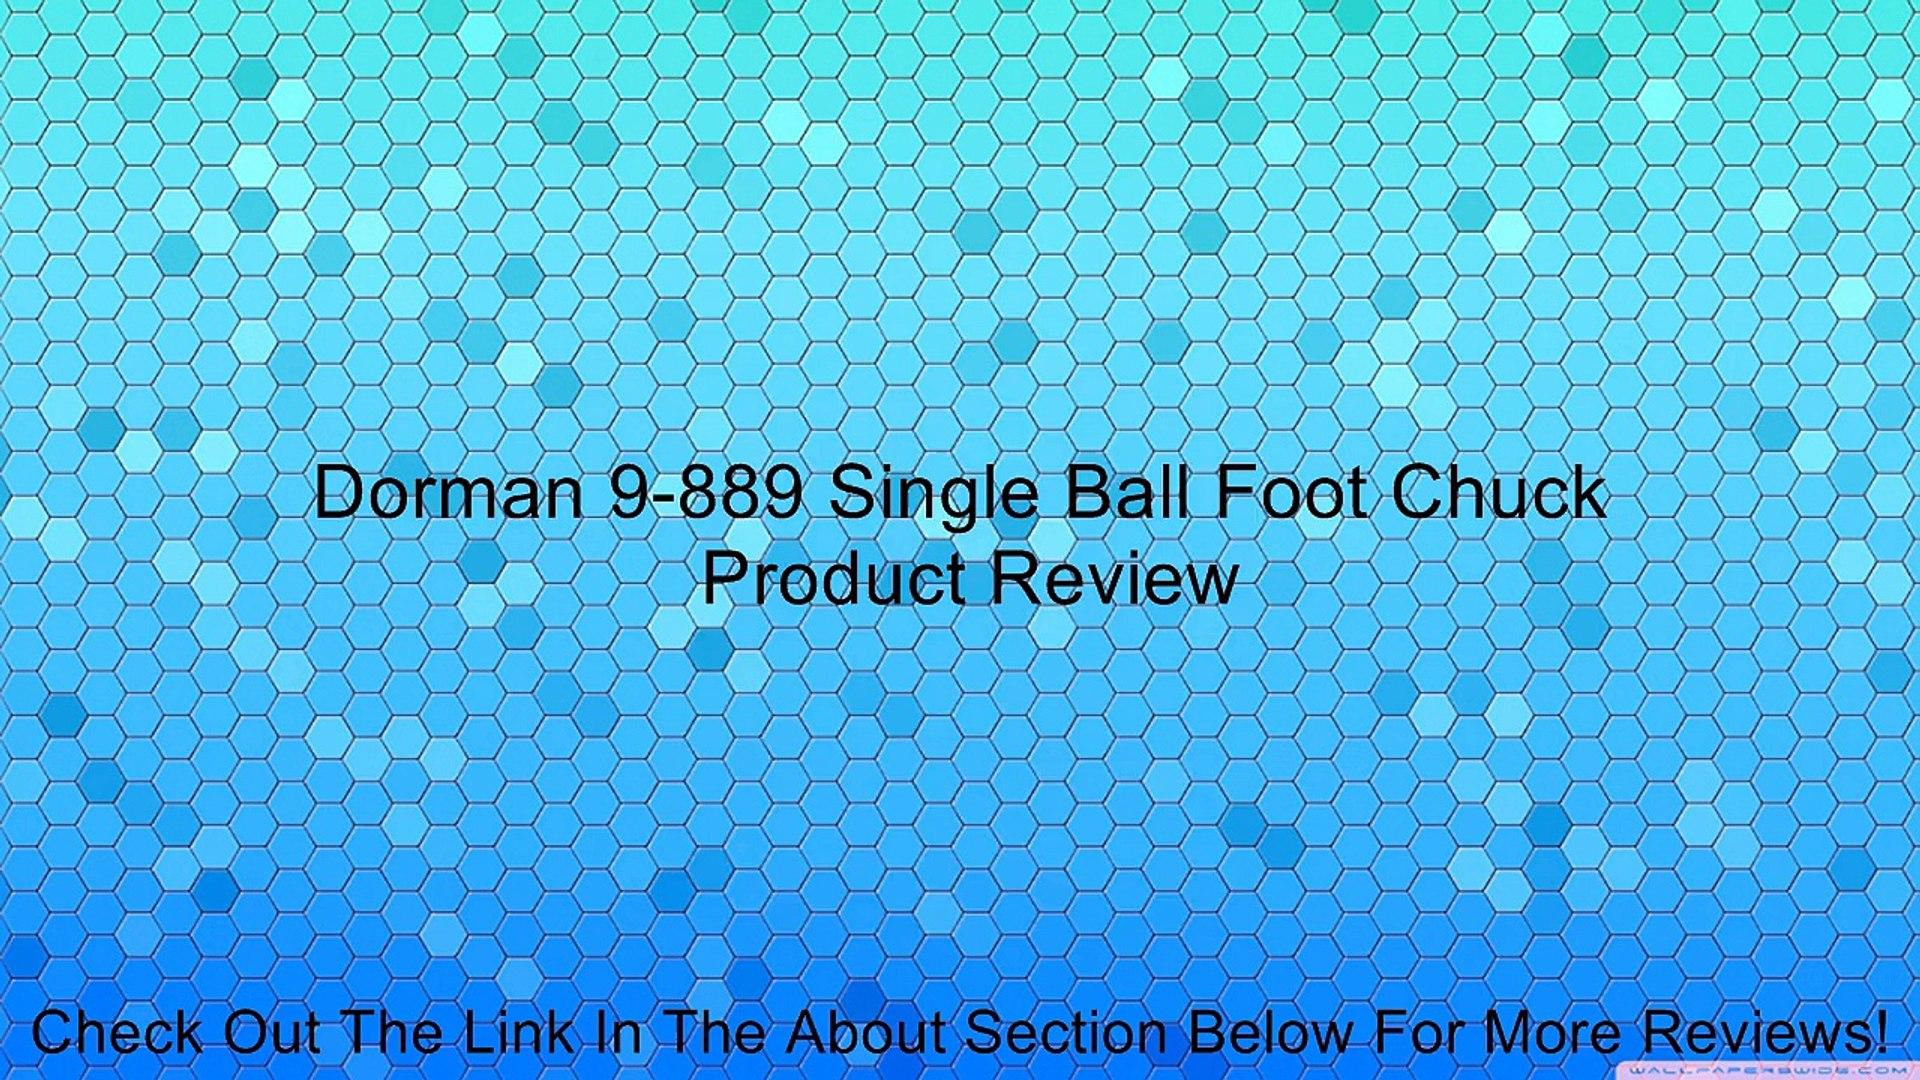 Dorman 9-889 Single Ball Foot Chuck Review